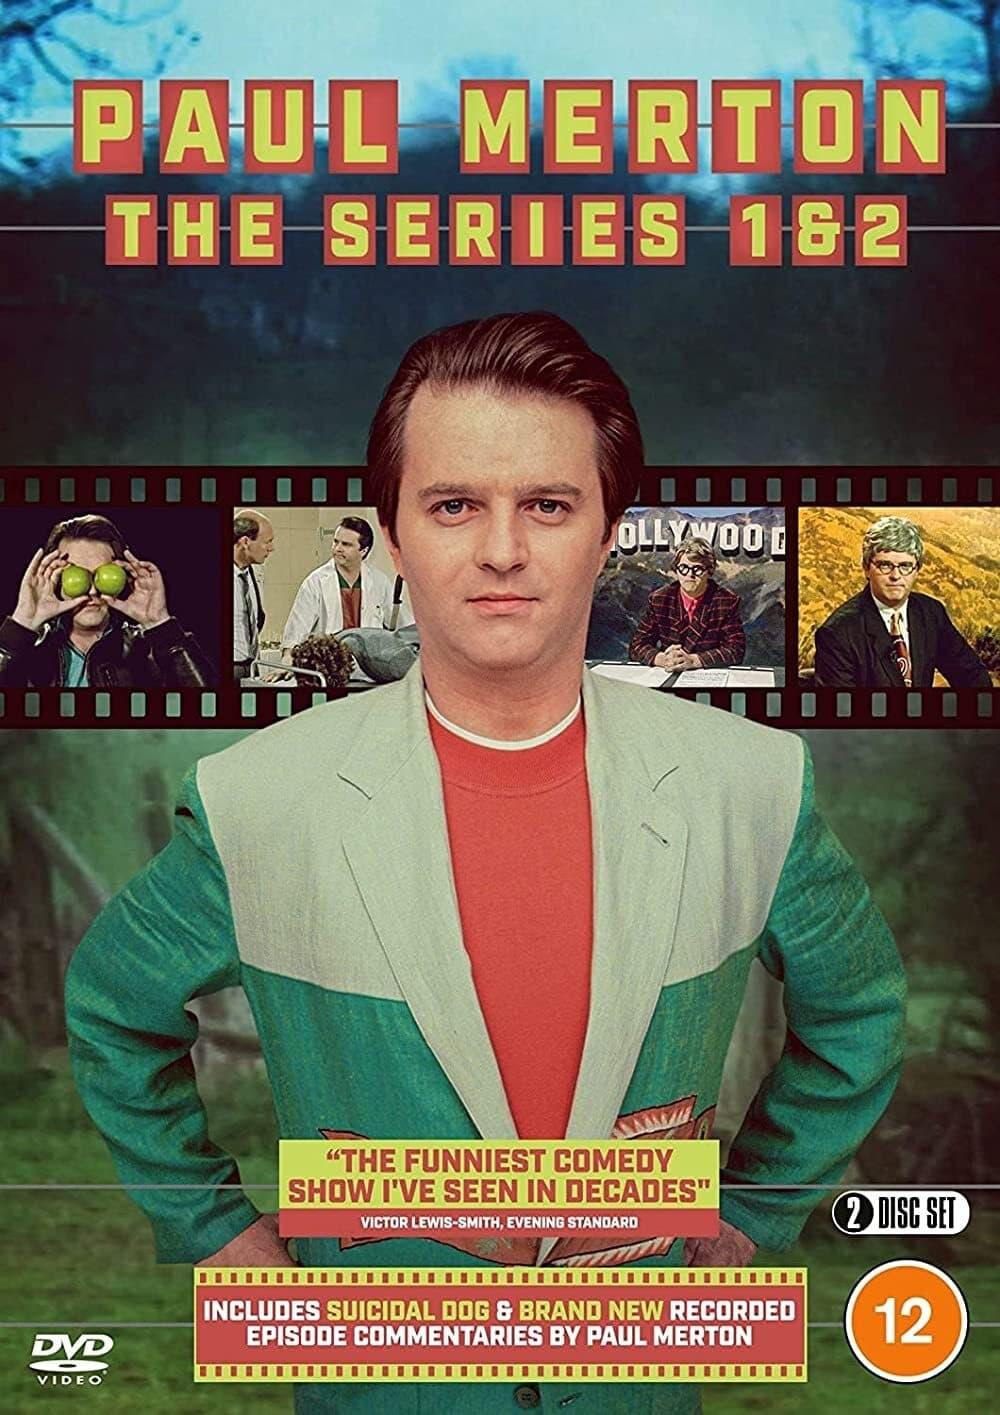 Paul Merton: The Series